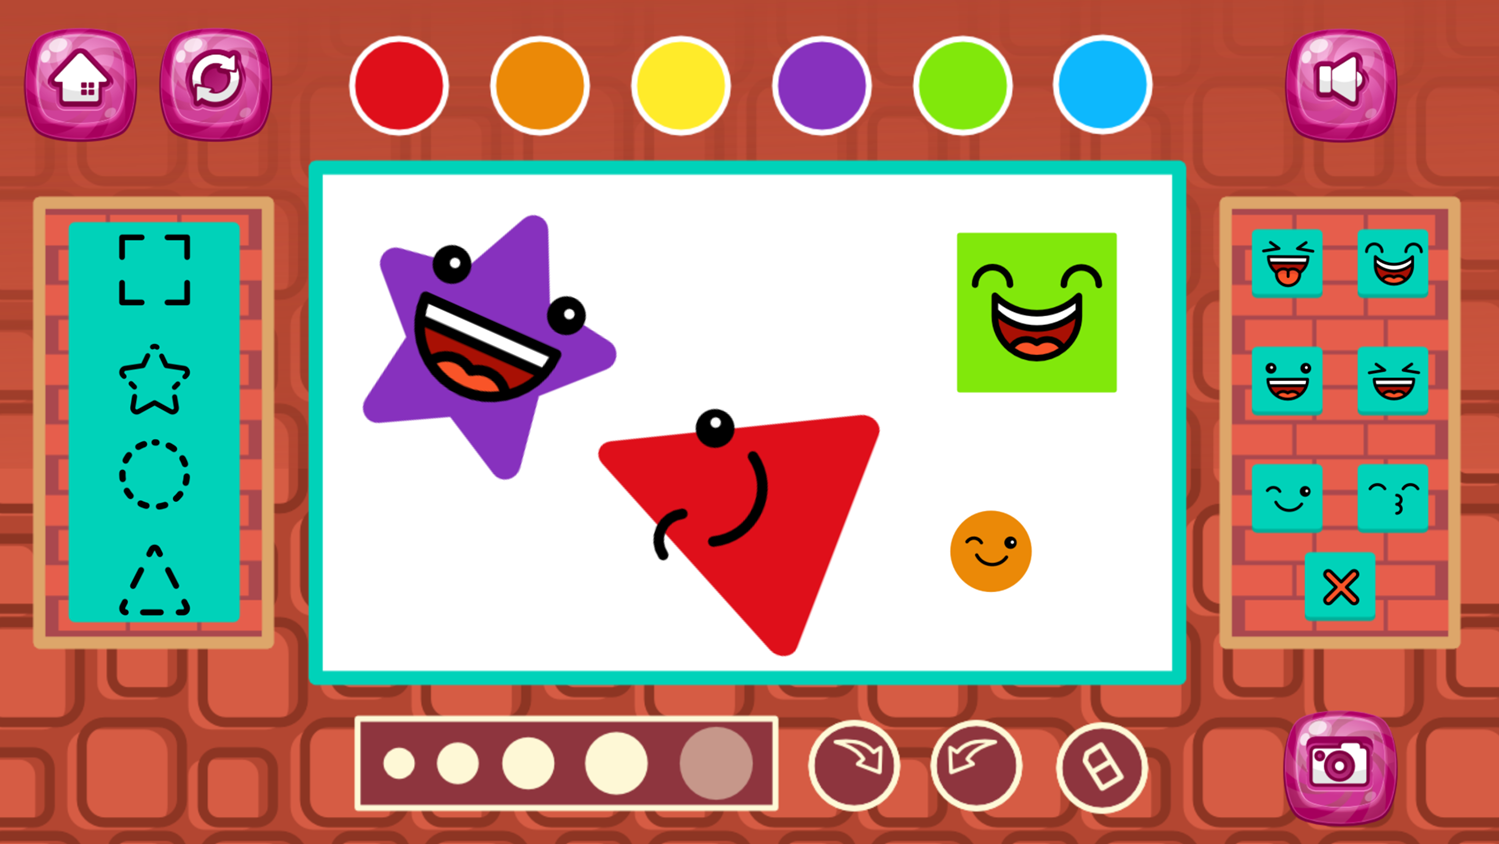 Cute Shapes Game Screenshot.